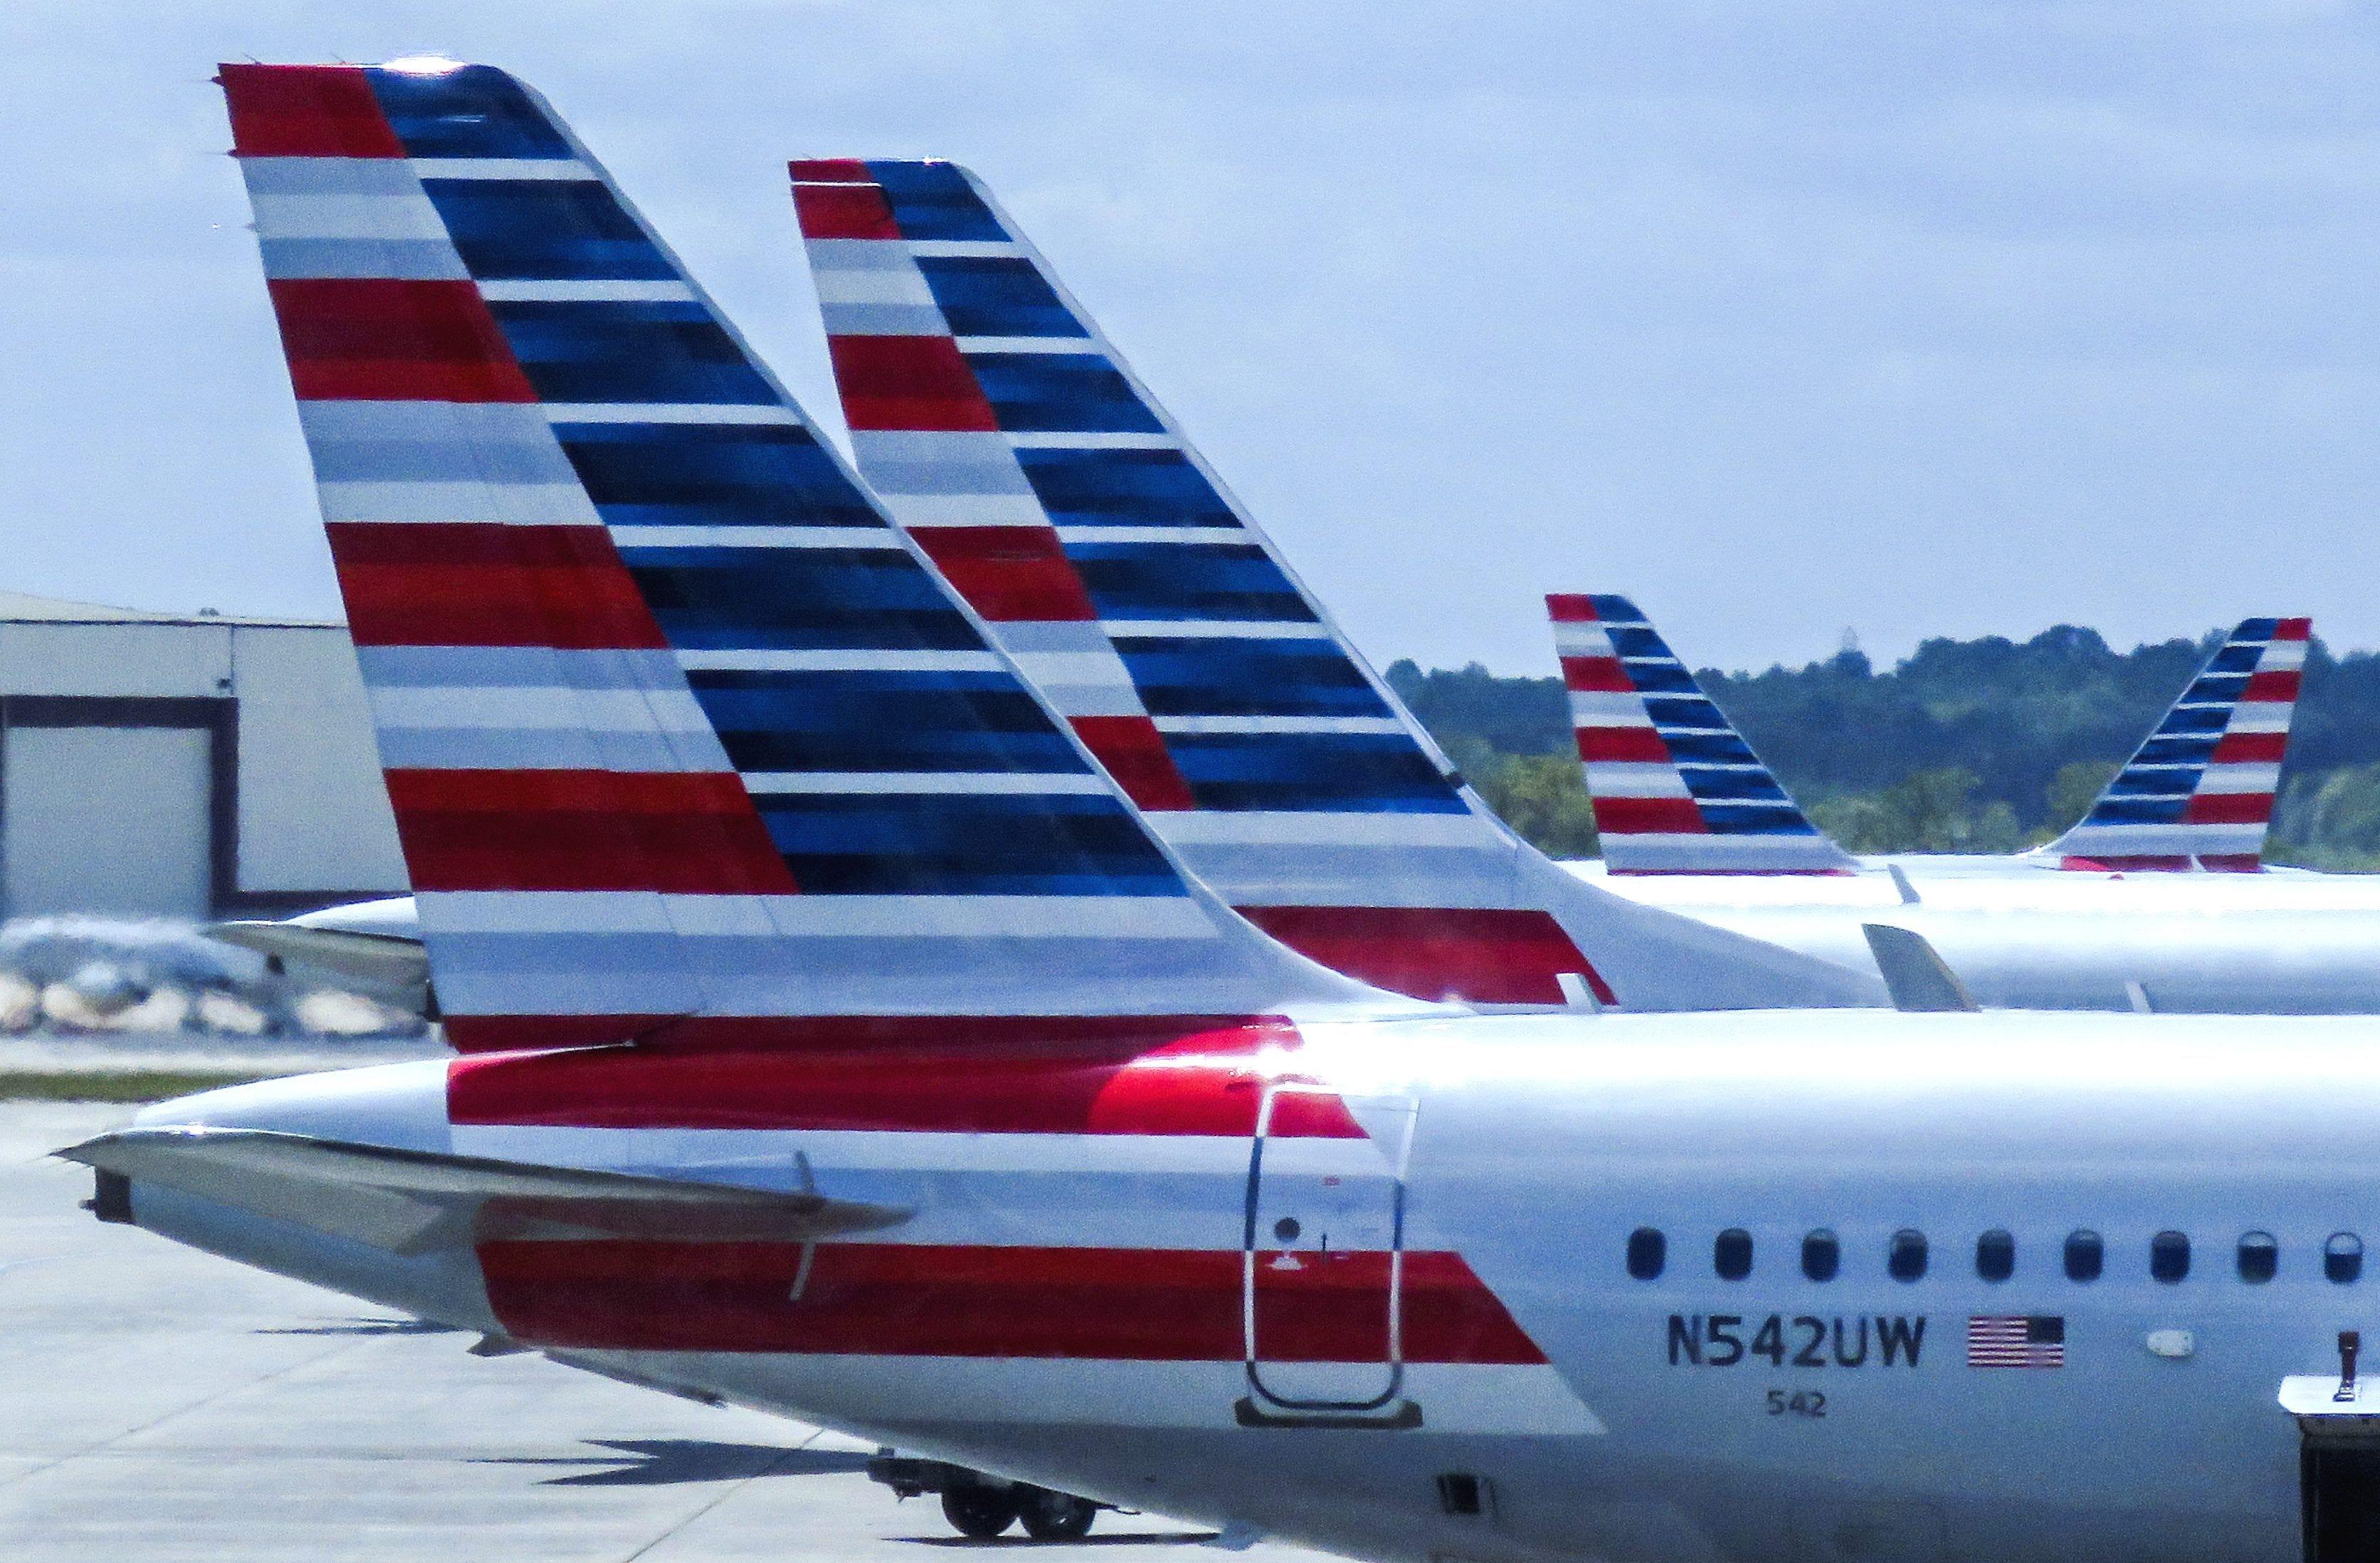 300+ flights canceled at Charlotte Douglas International Airport